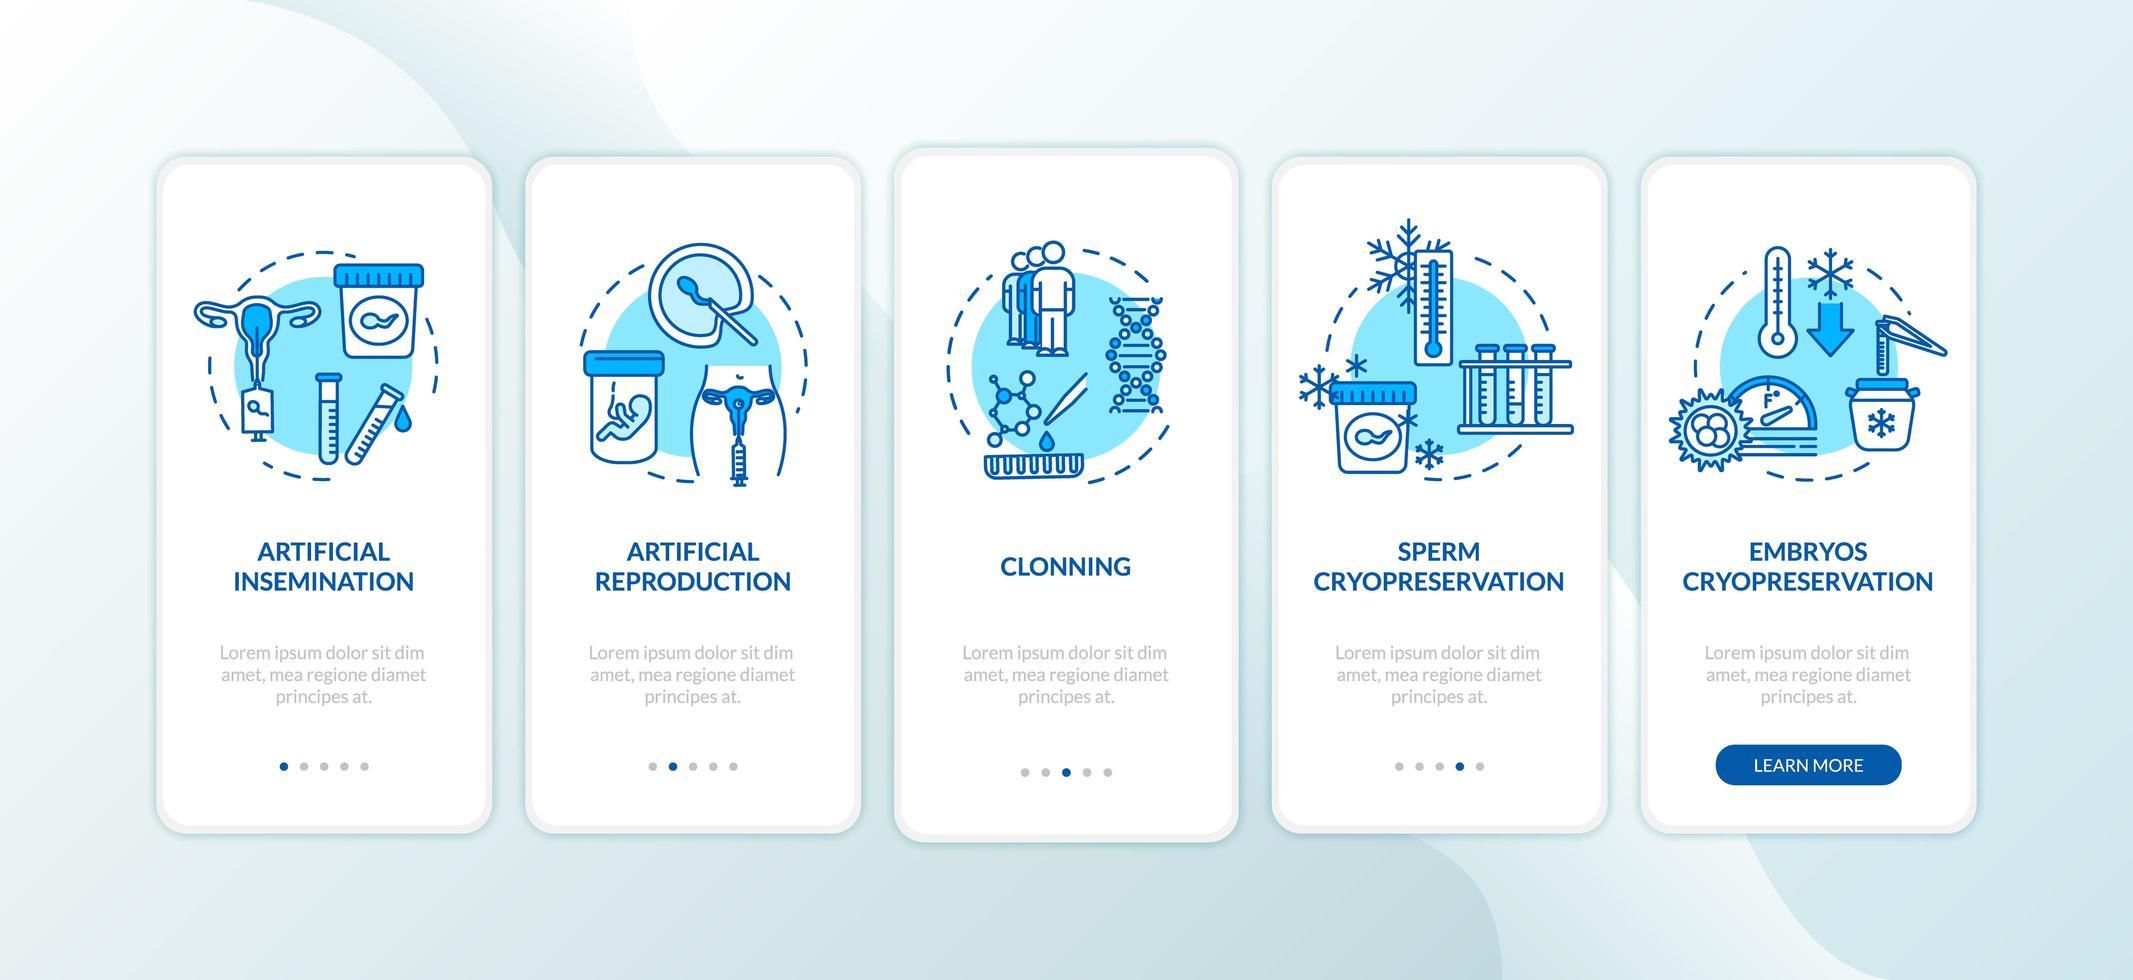 aplicación móvil de incorporación de reproducción artificial vector